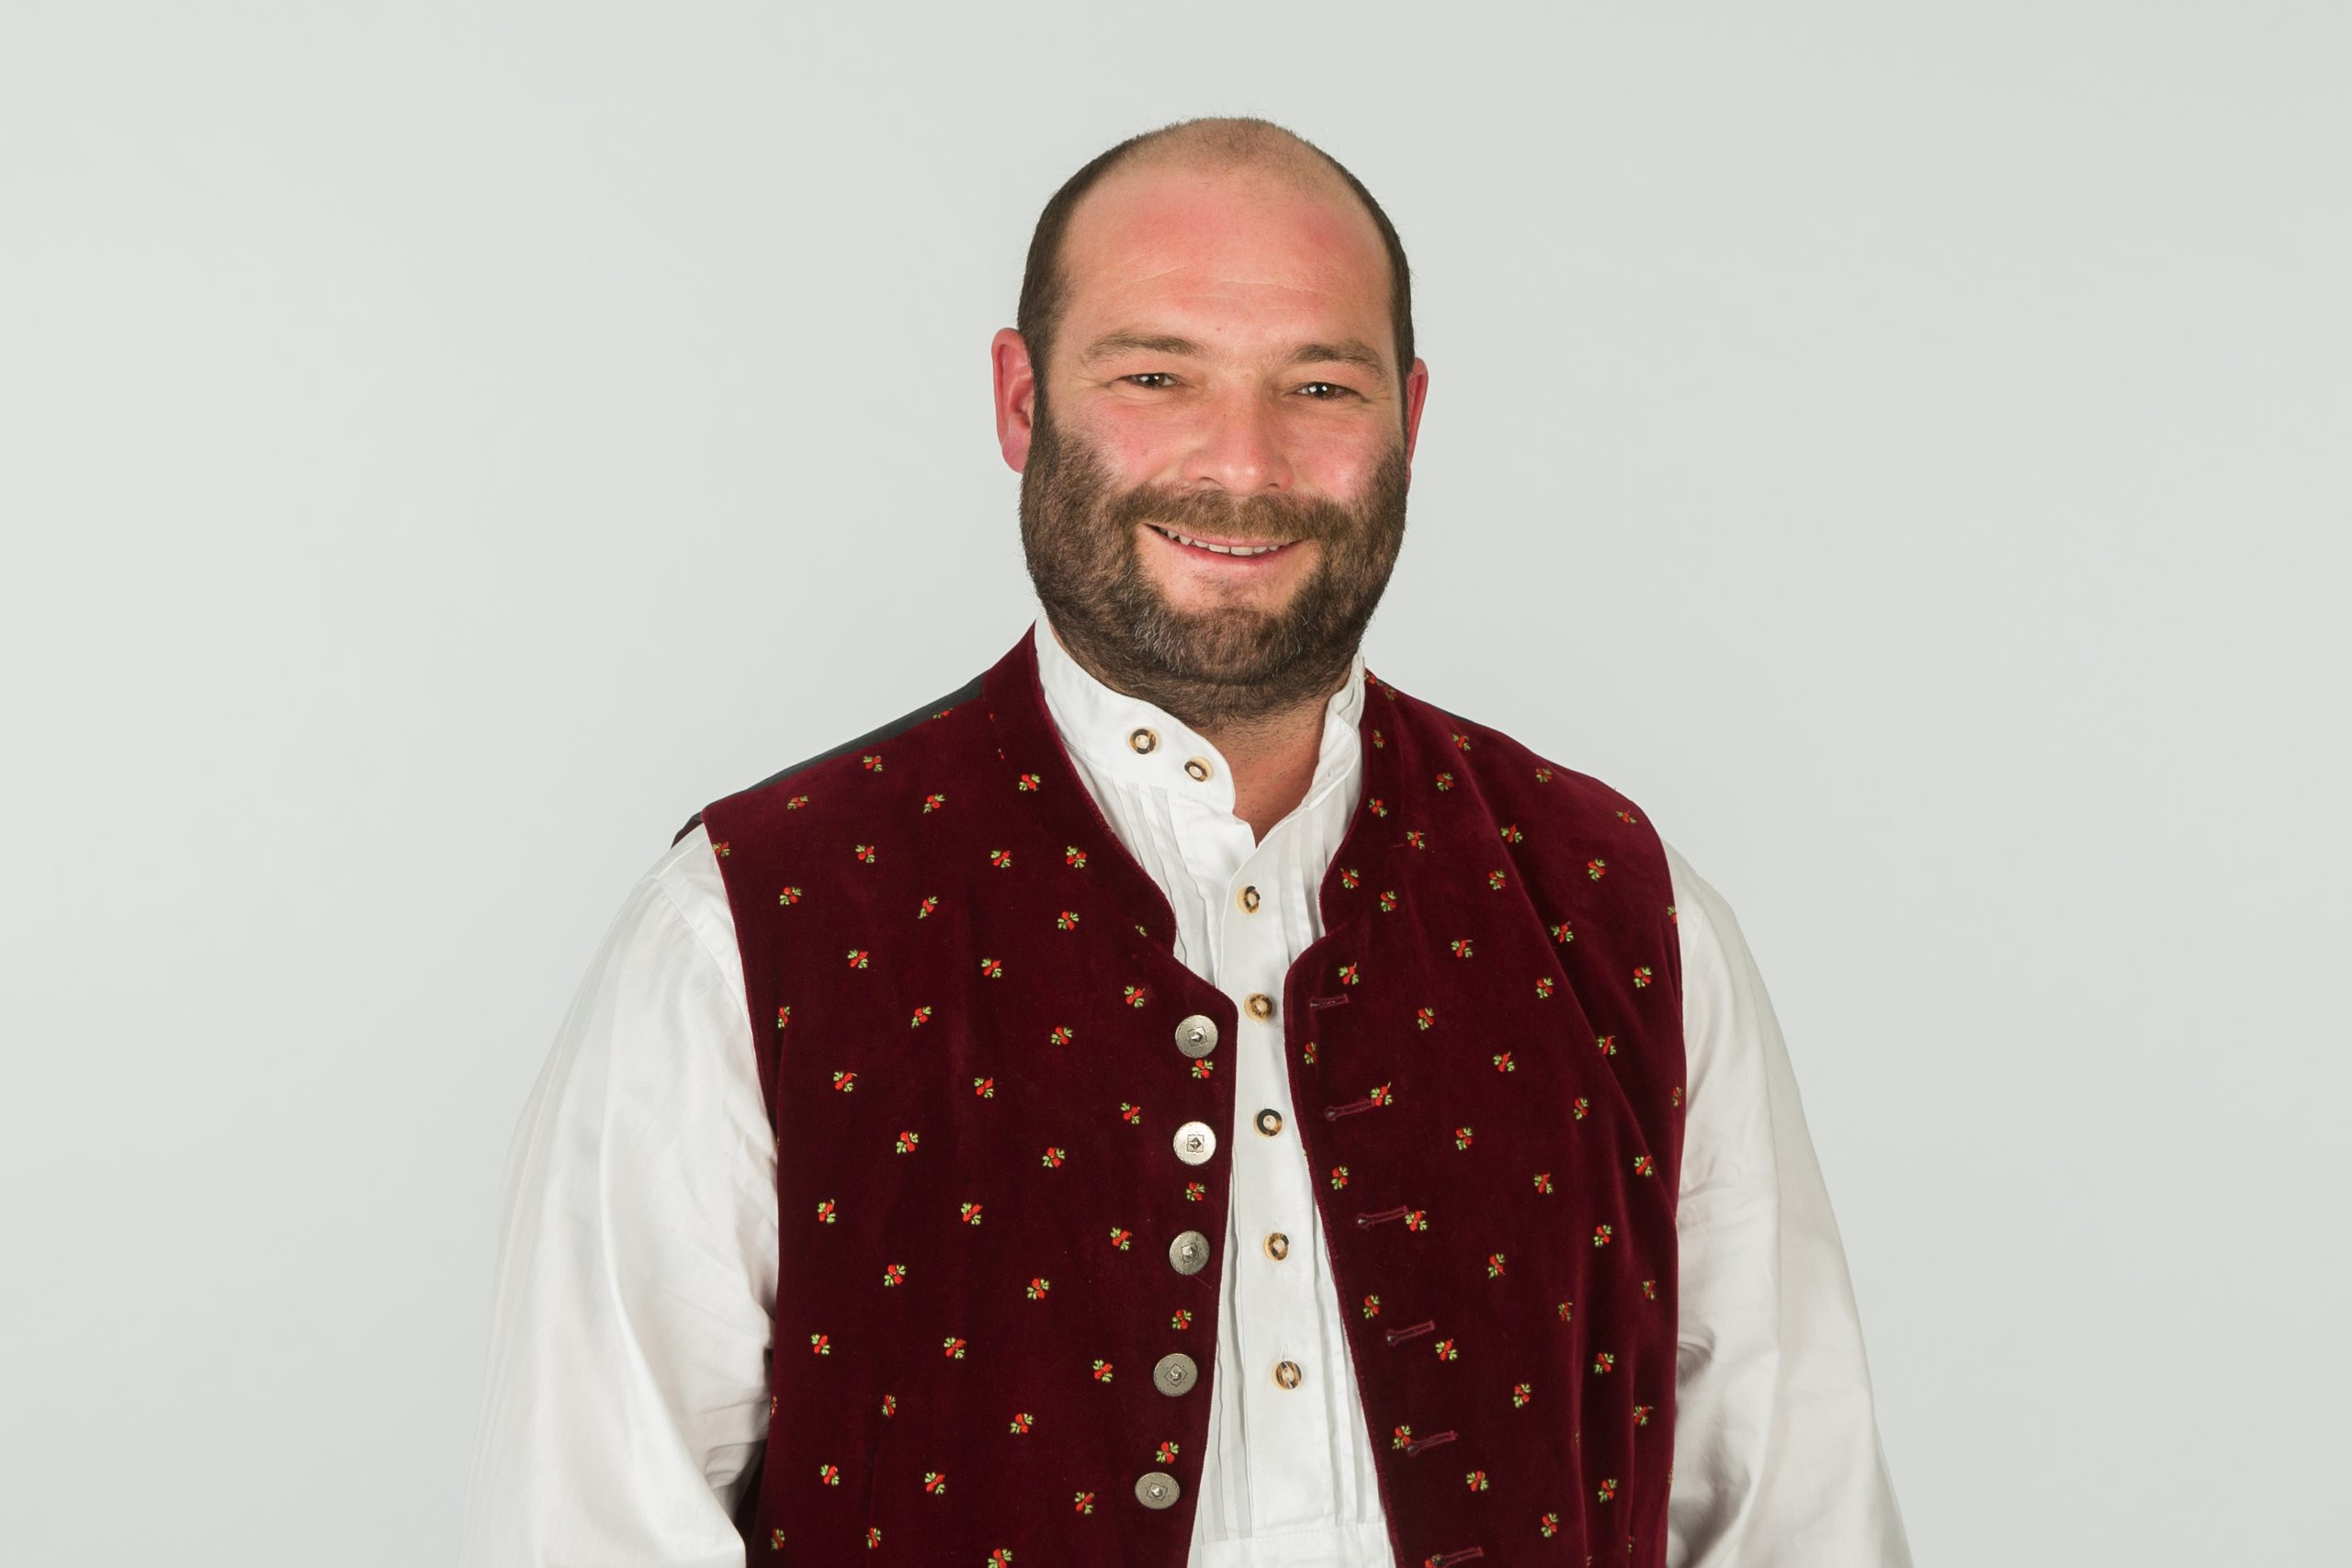 Wolfgang Dangl